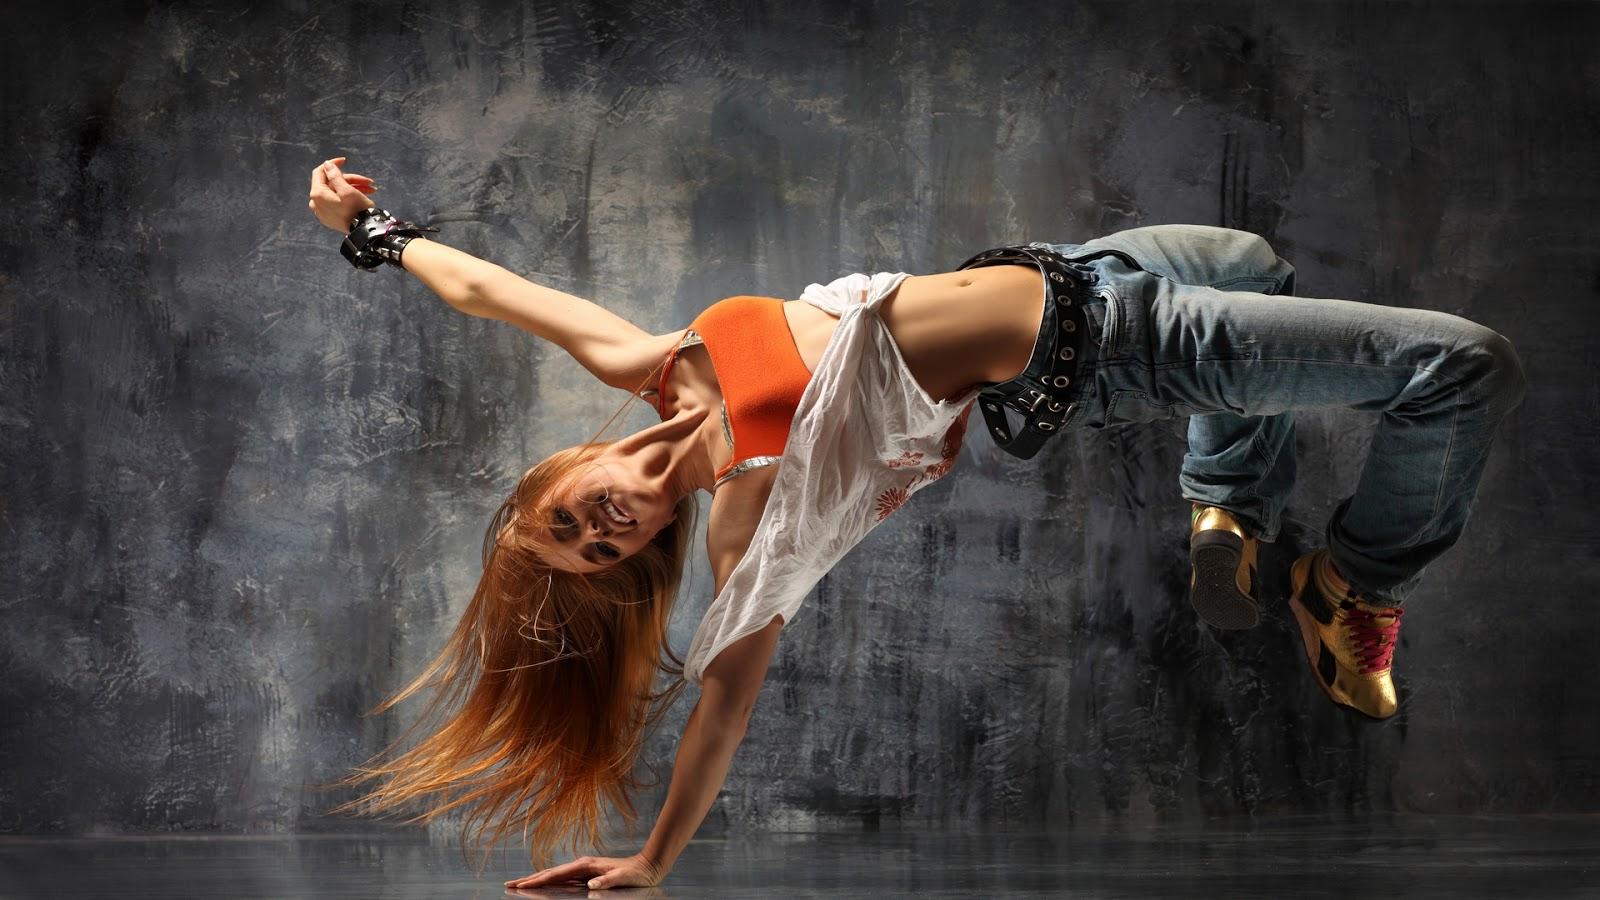 free wallpaper dekstop dance hd wallpaper dance wallpaper